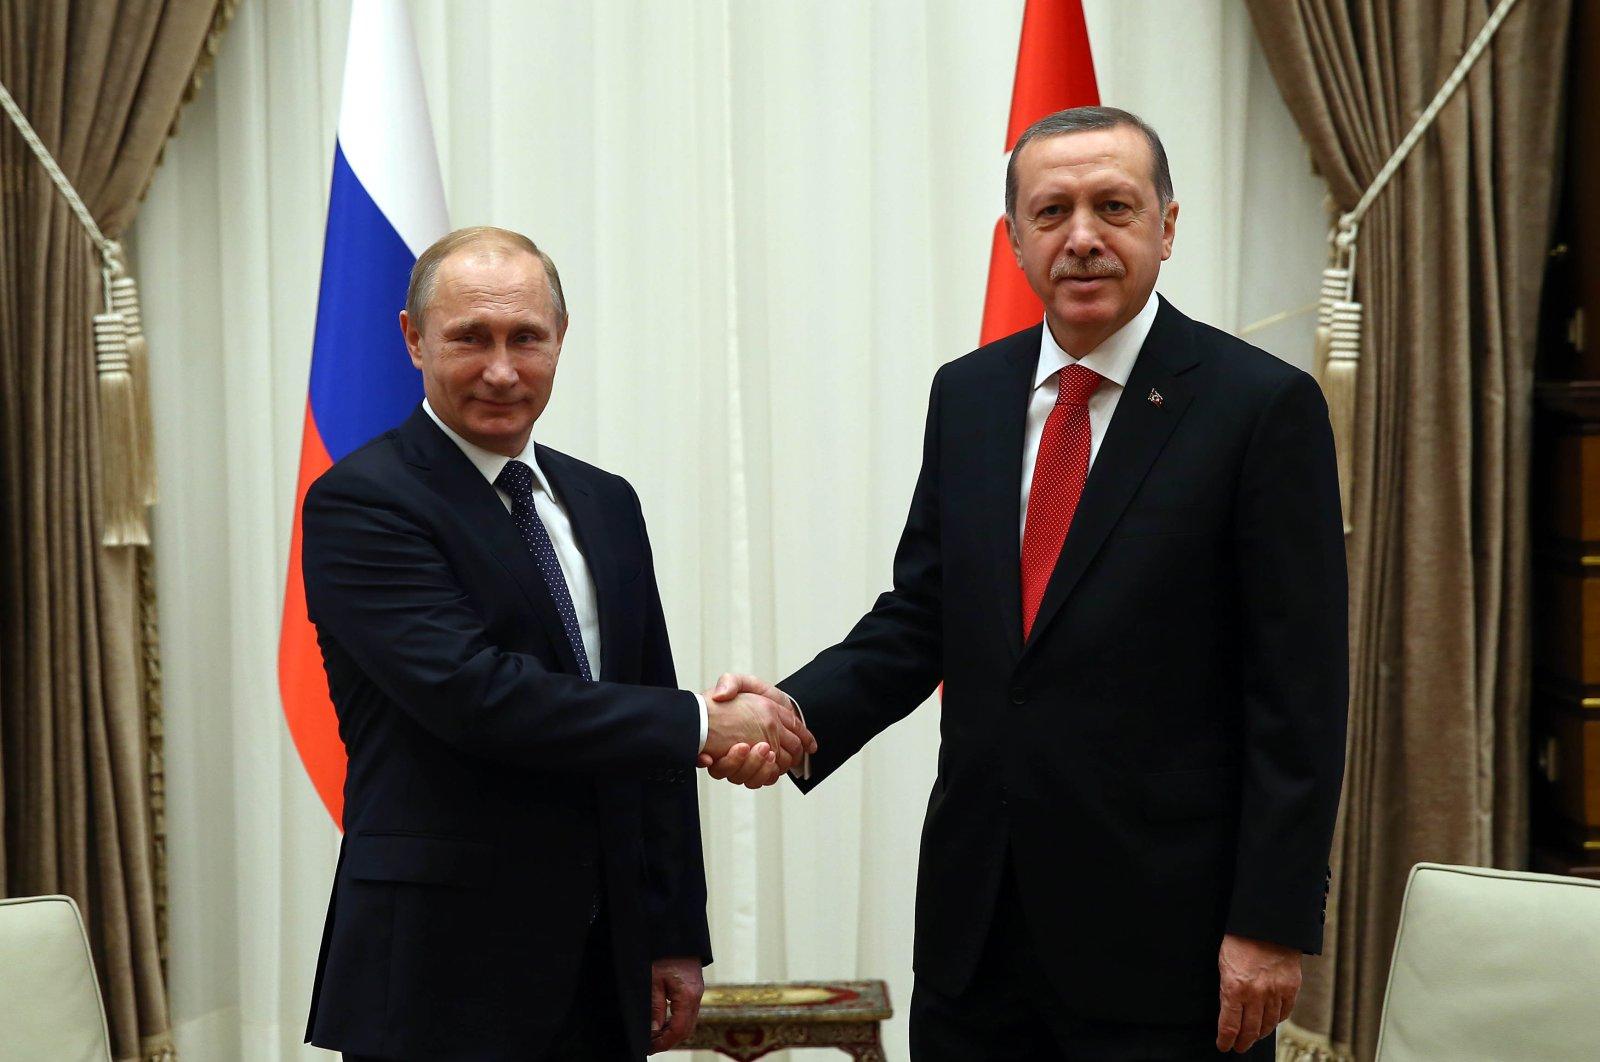 Russian President Vladimir Putin President (L) and President Recep Tayyip Erdoğan shake hands during a meeting, Istanbul, Turkey, Dec. 1, 2014. (Courtesy of the Turkish Presidency)